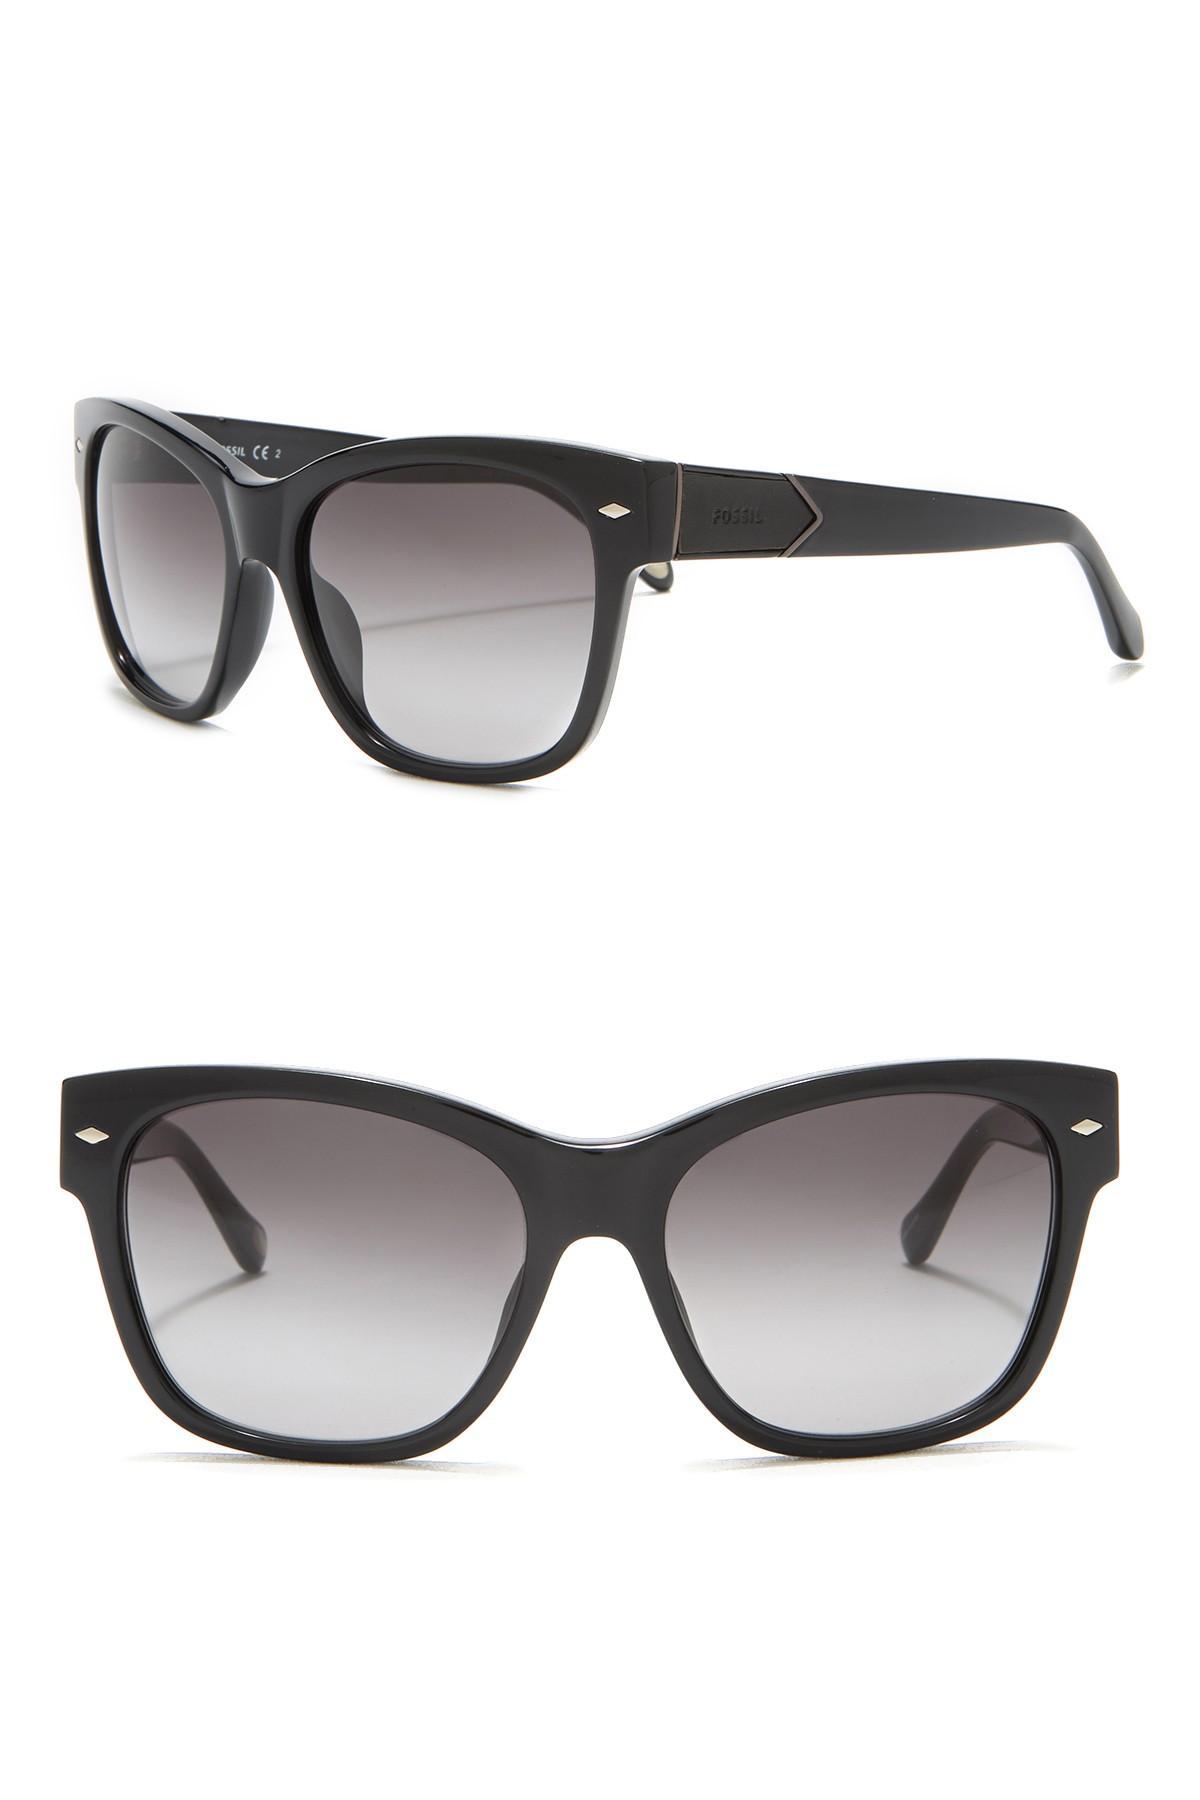 Retro Sunglasses 55mm Lyst Lyst Fossil Fossil Retro 3LRjq54A